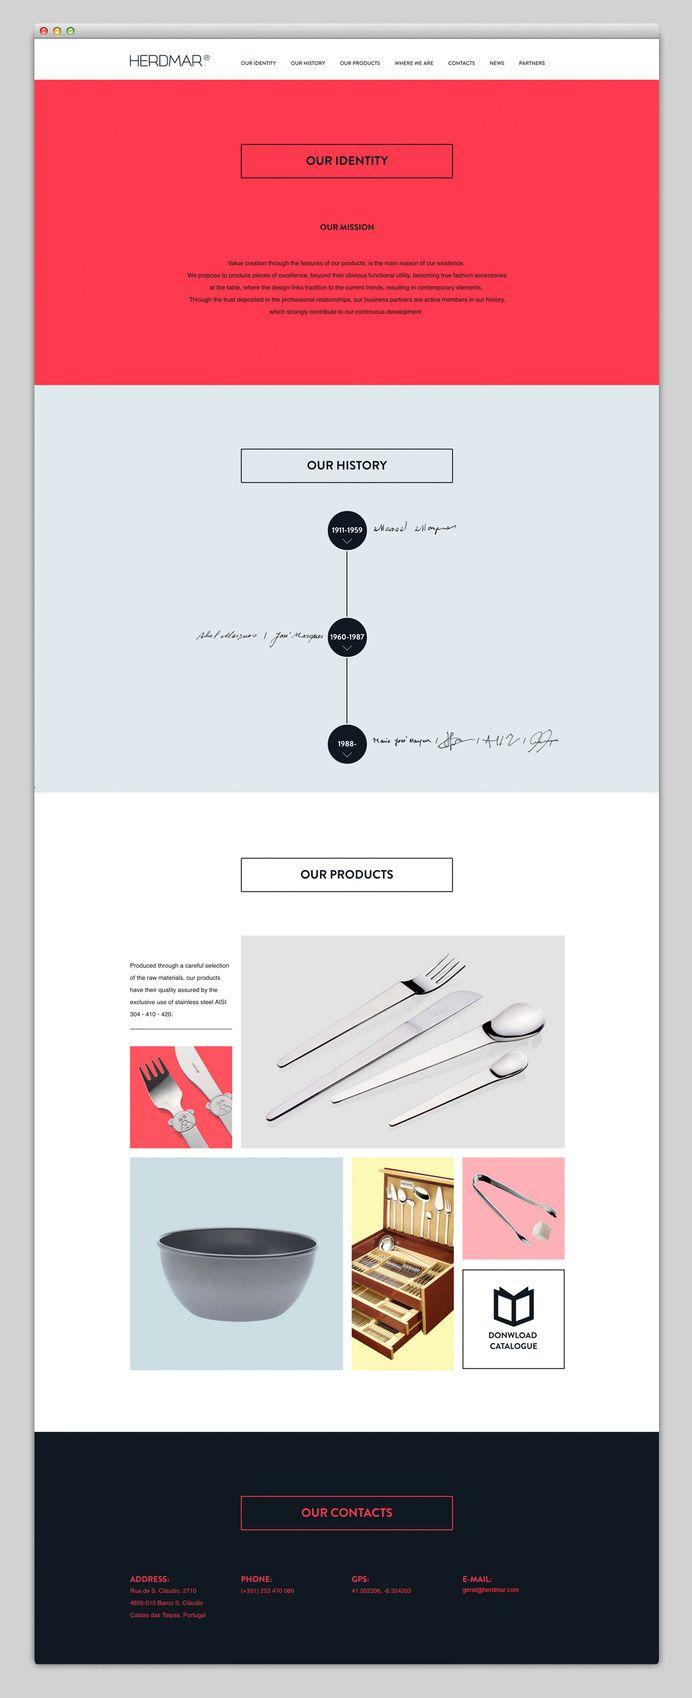 Websites We Love — Showcasing The Best in Web Design in Web design